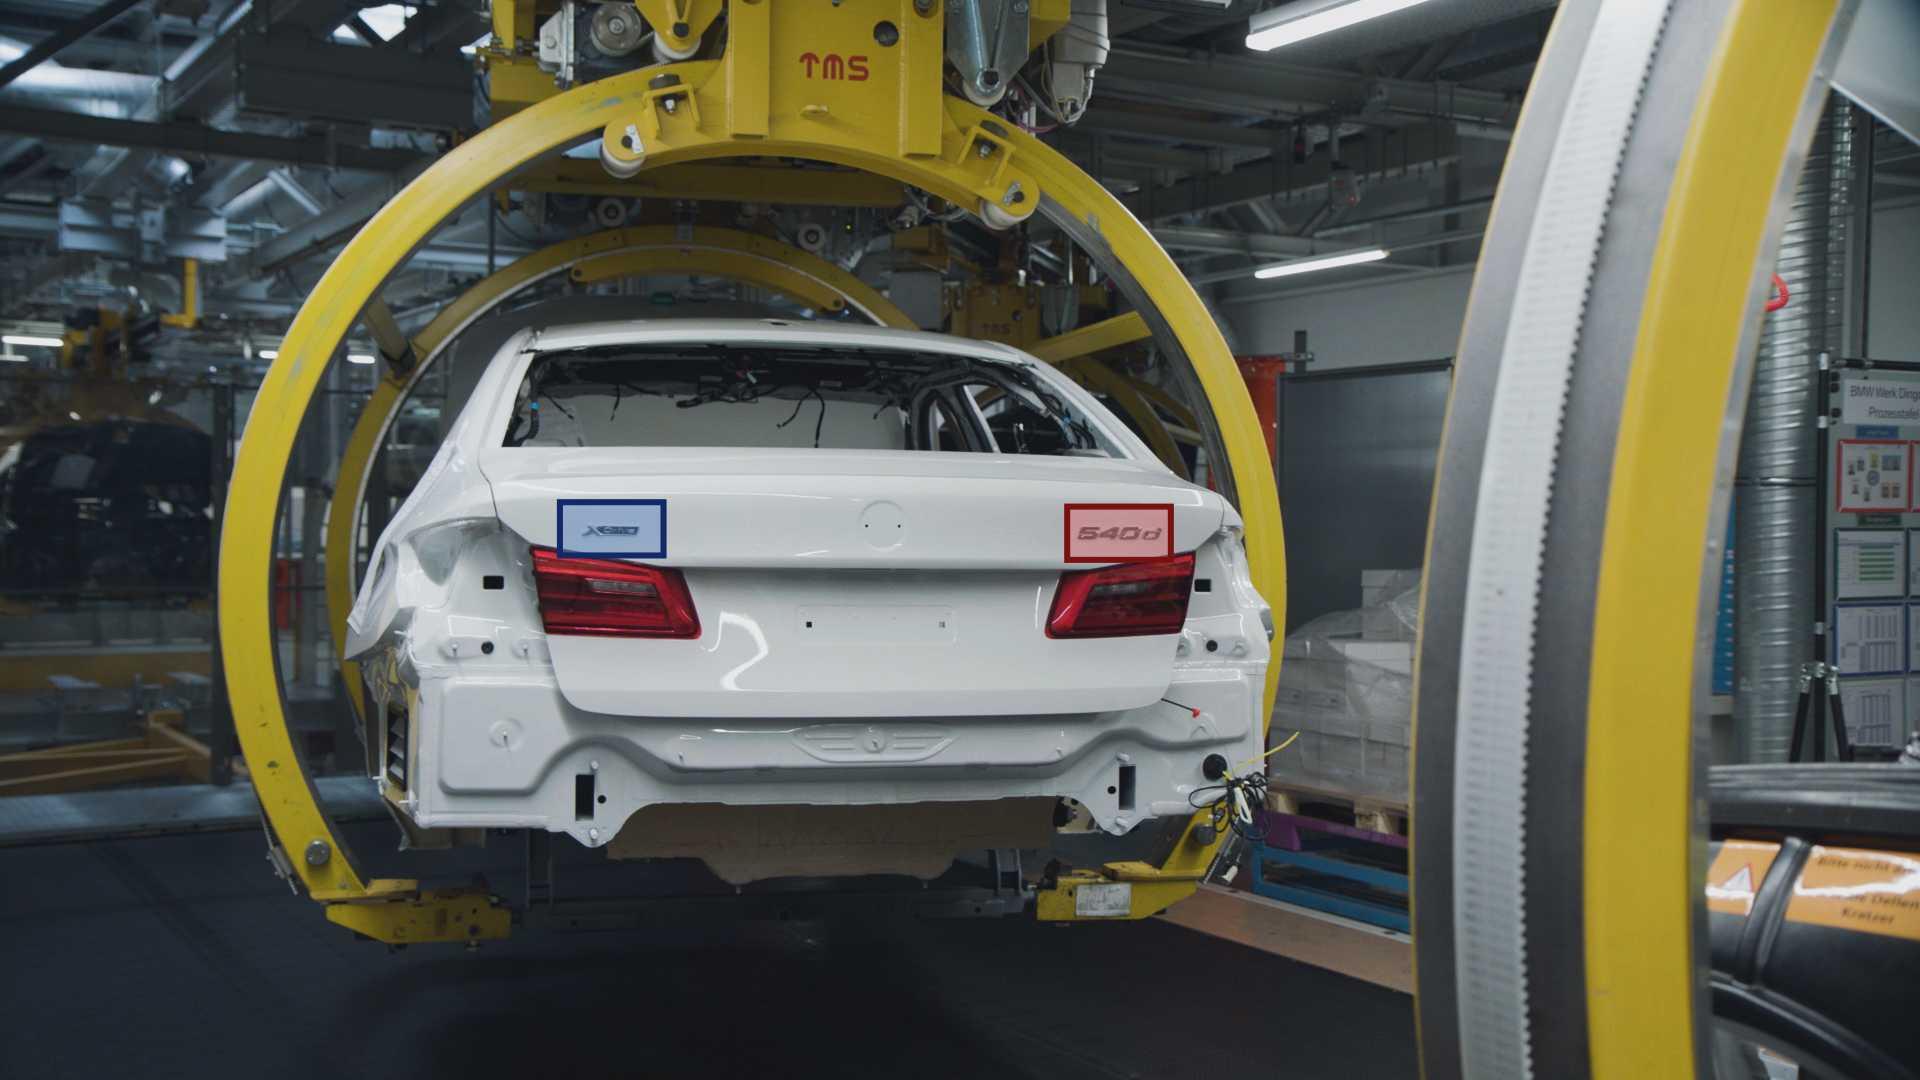 Control of model designation by KI-camera, Assembly BMW Group Plant Dingolfing (Symbolic illustration) (07/2019)